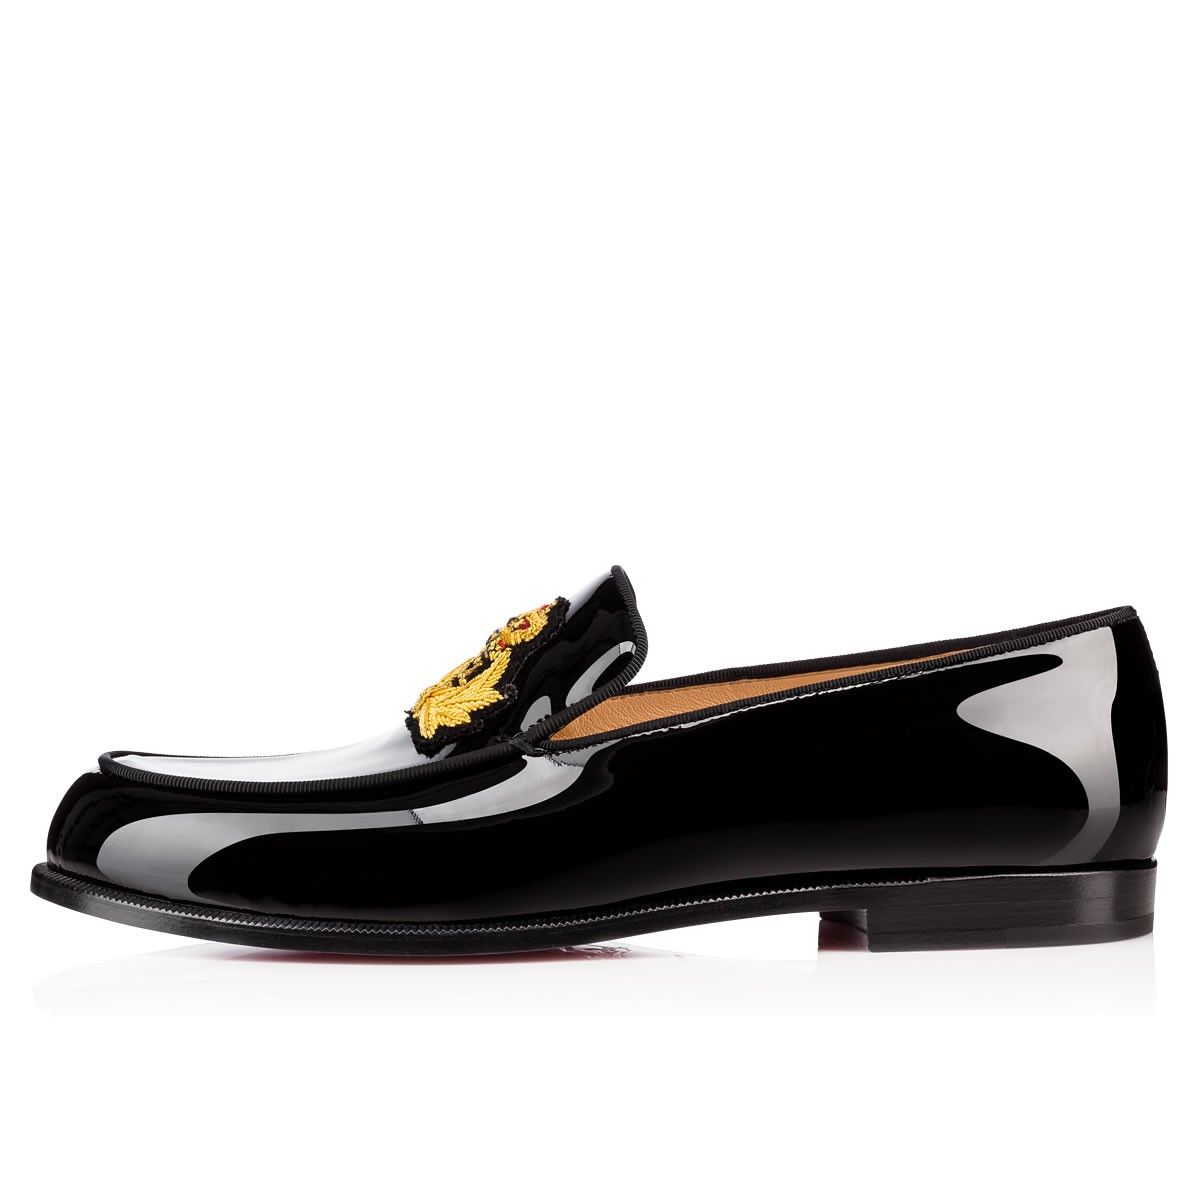 44c8cf5435dc Black · Shoes - Laperouza Flat - Christian Louboutin